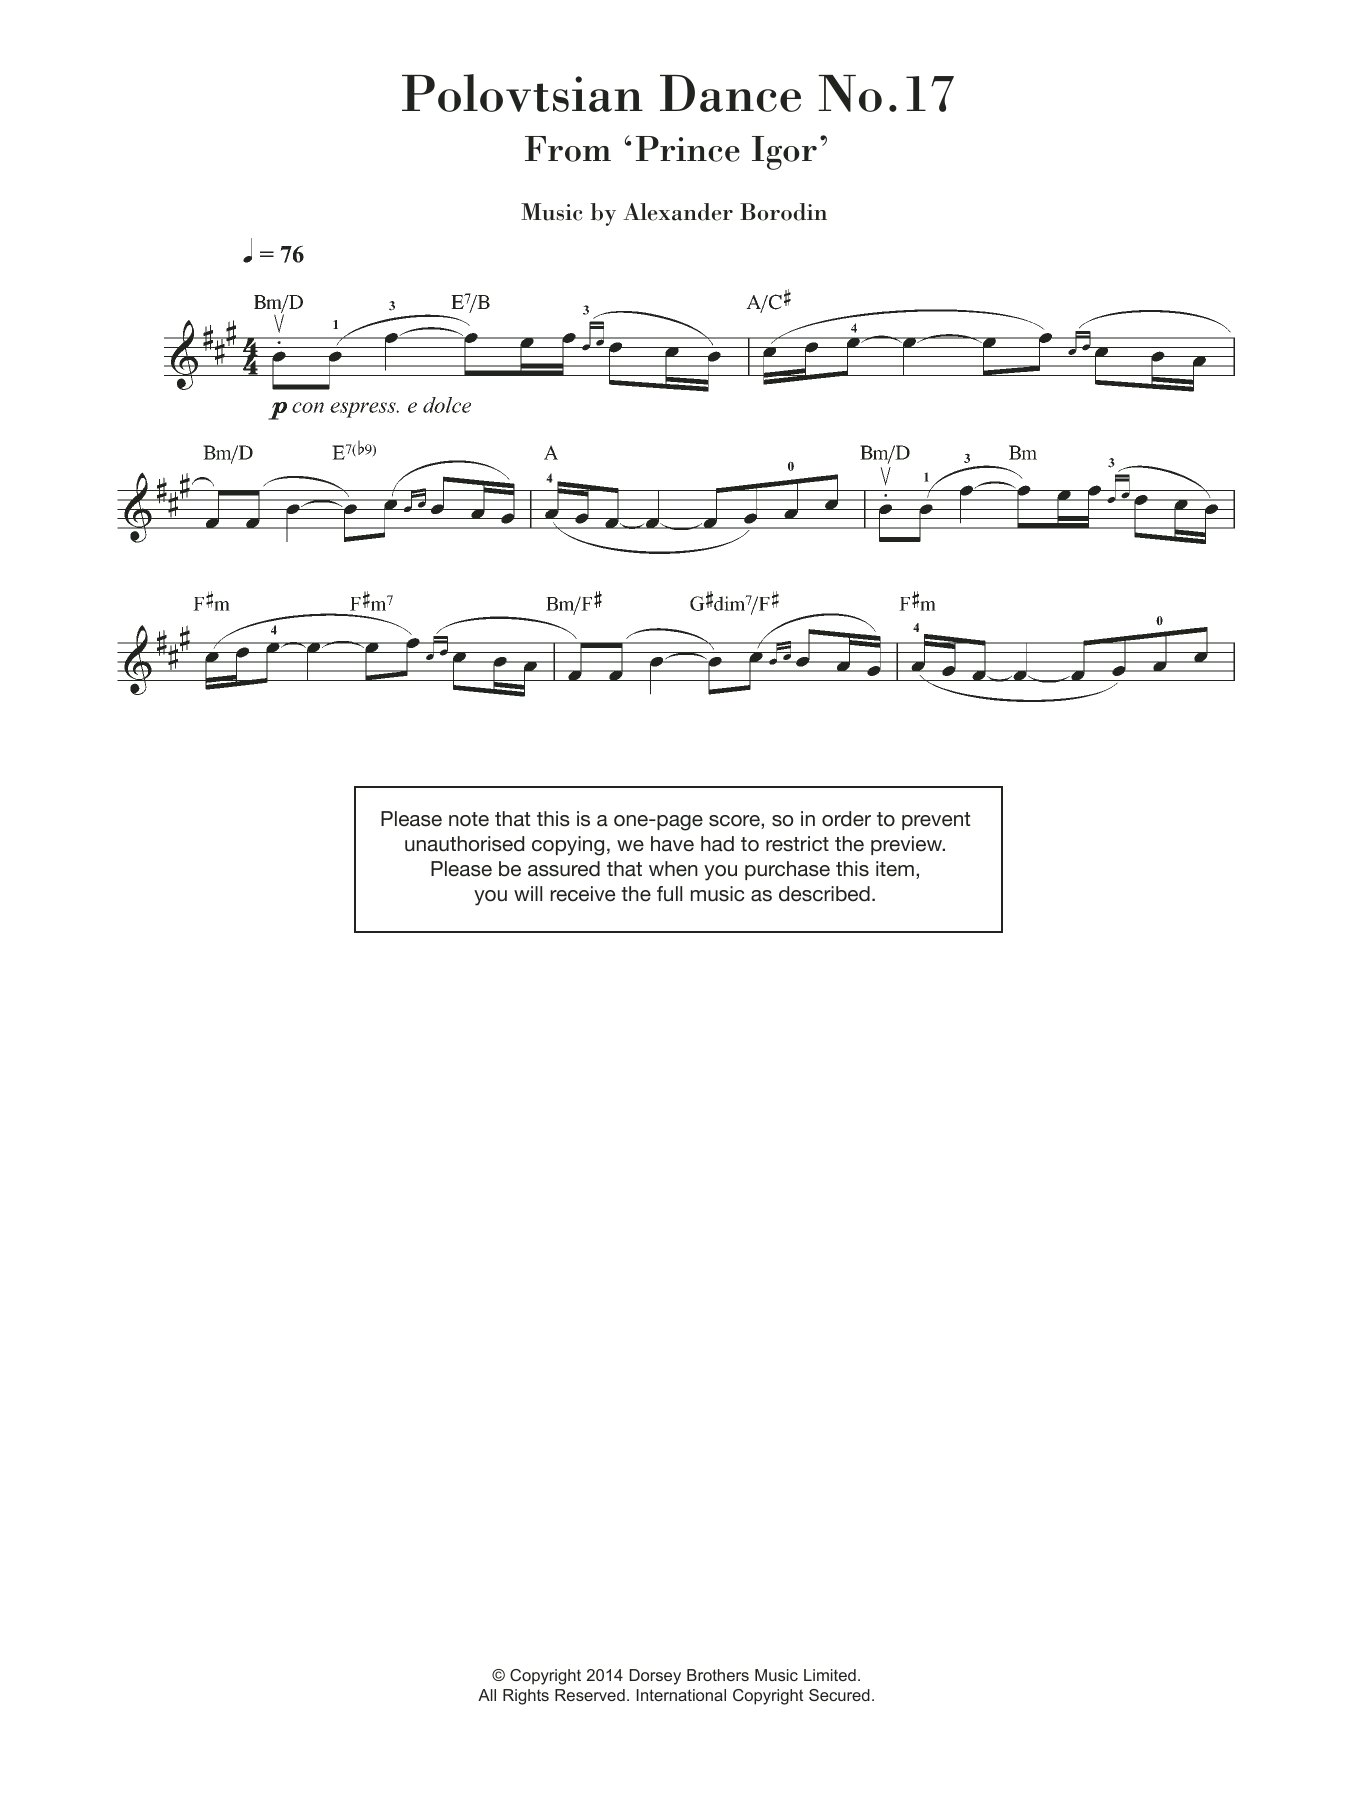 Alexander Borodin - Polovtsian Dance No.17 (from 'Prince Igor')